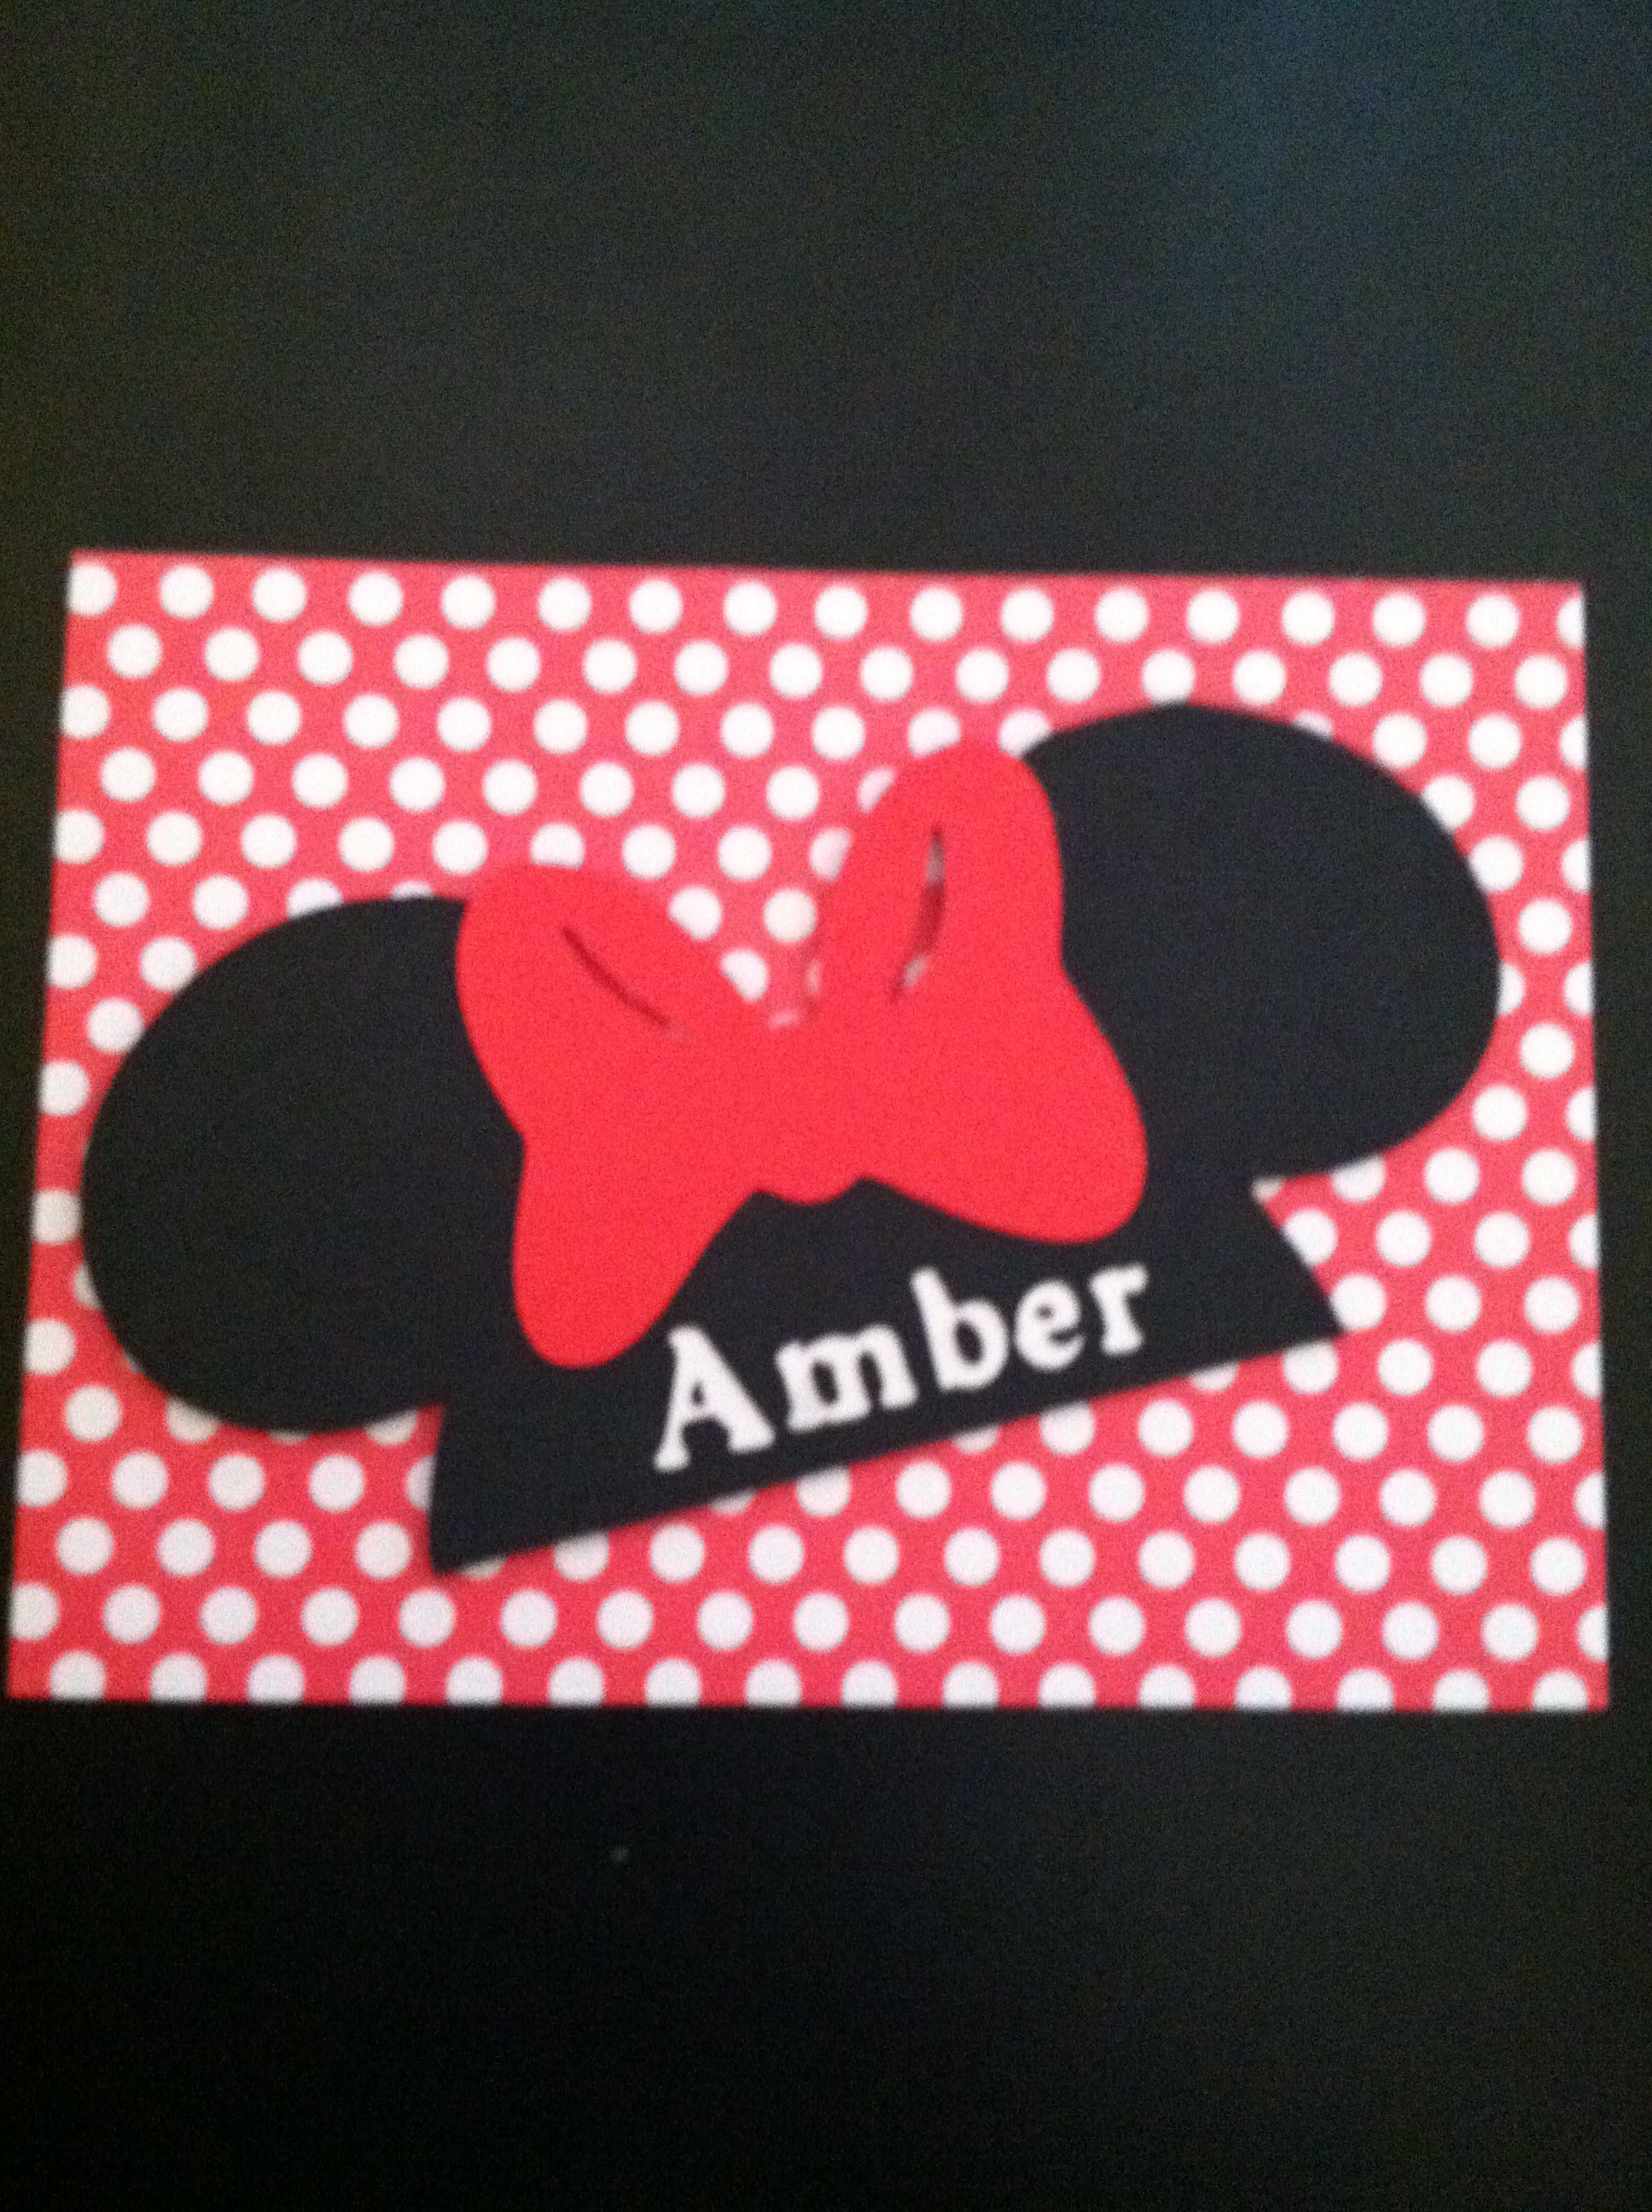 Minnie Mouse birthday card made with Cricut